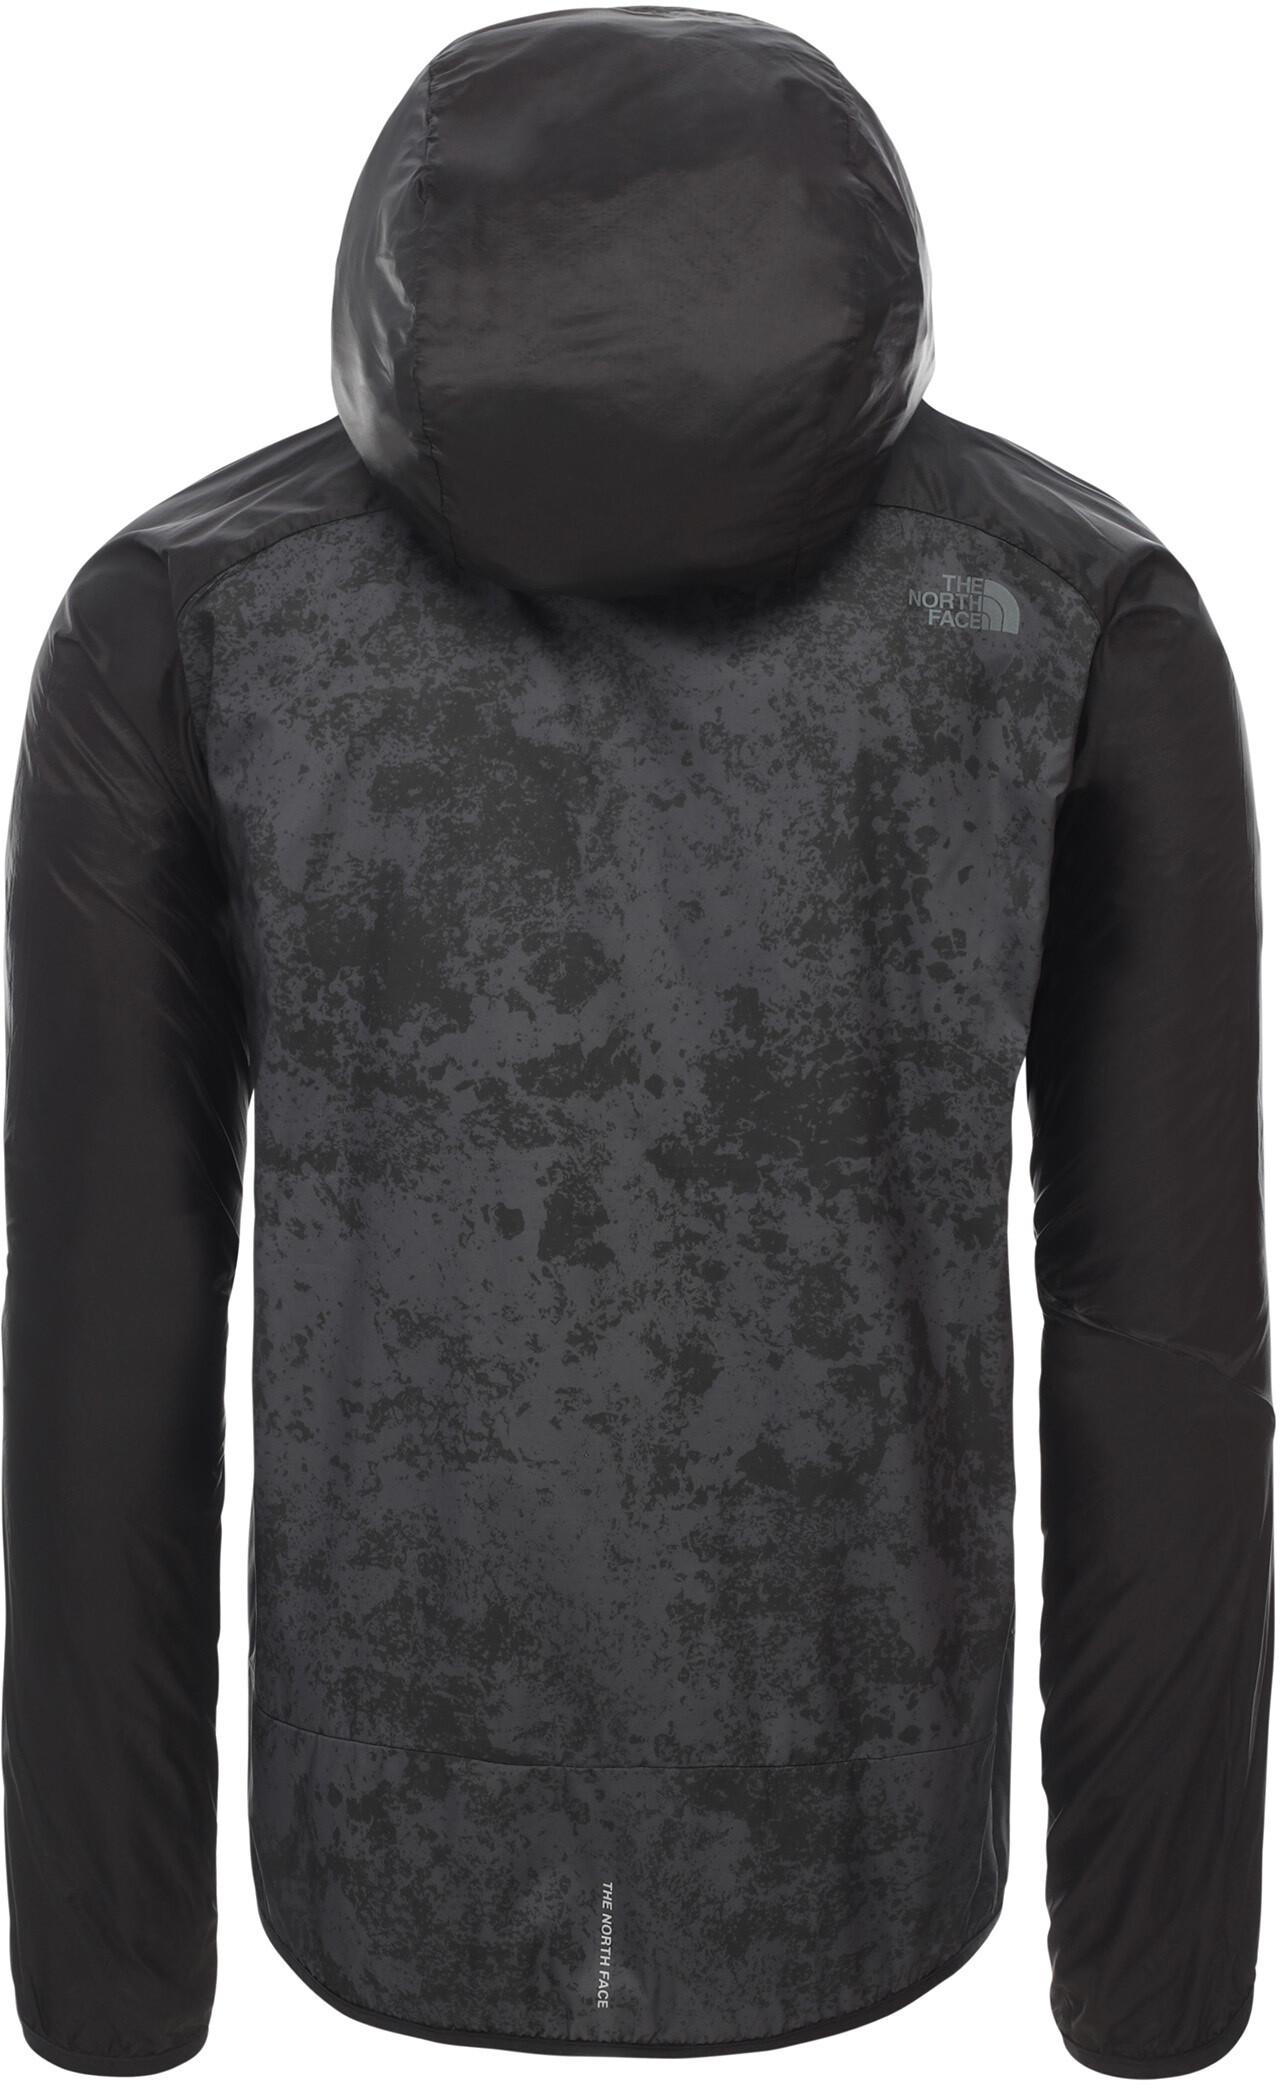 The North Face Ambition Windjacke Herren asphalt grey grunge printtnf black